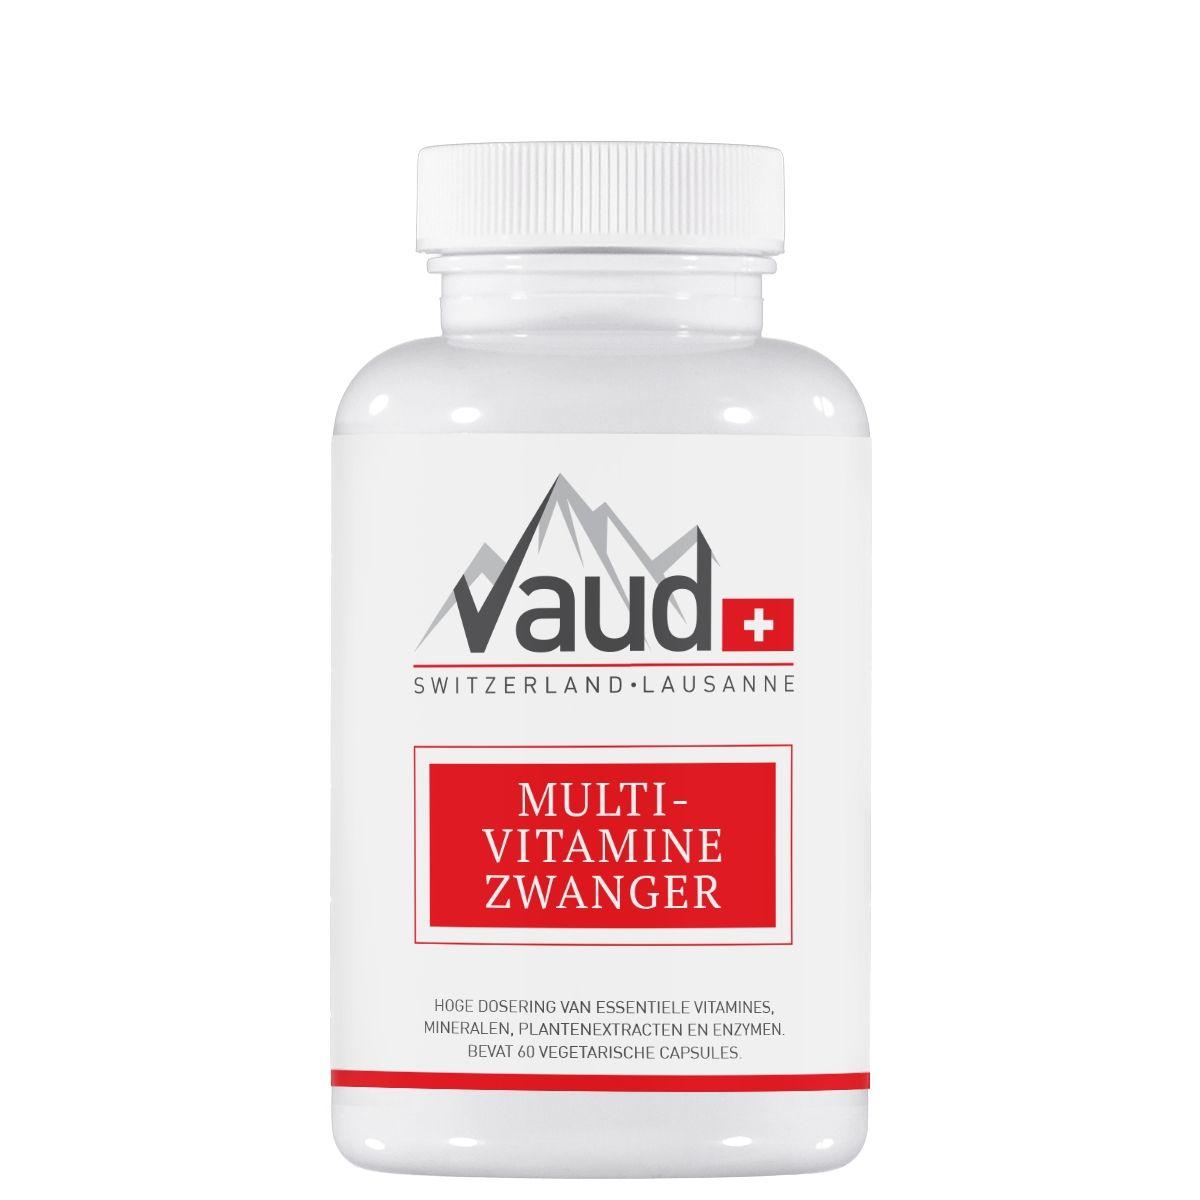 Multi vitamine zwanger